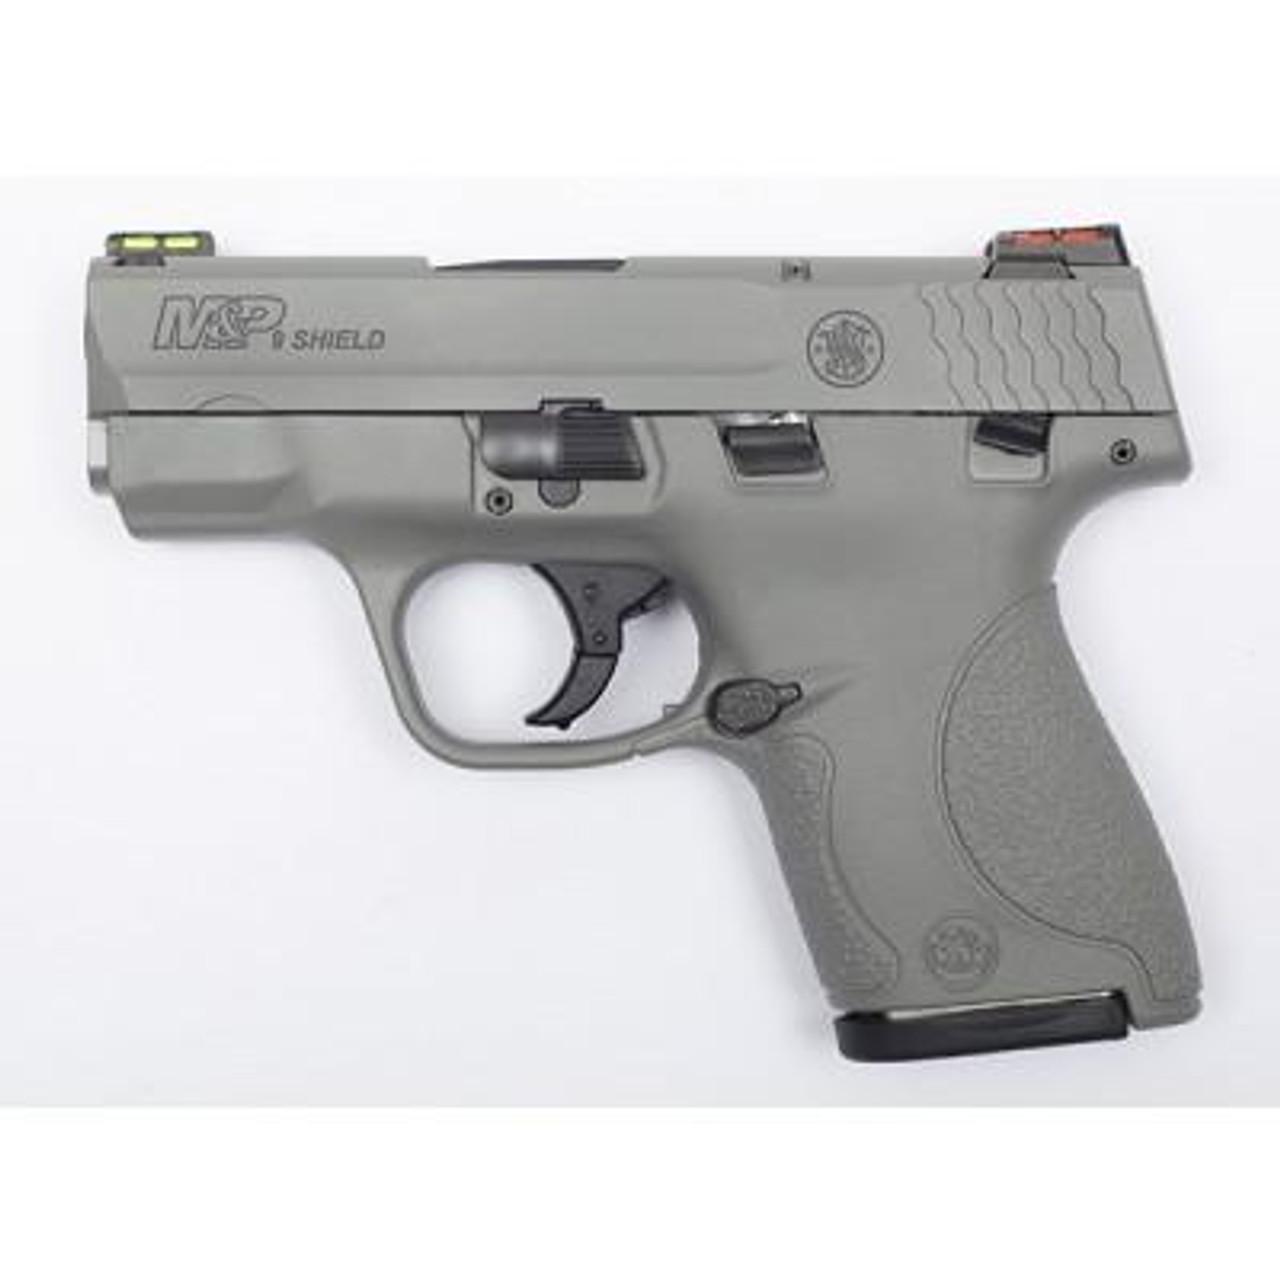 Smith & Wesson M&P 9 Shield Hi Viz CALIFORNIA LEGAL - 9mm GRAY